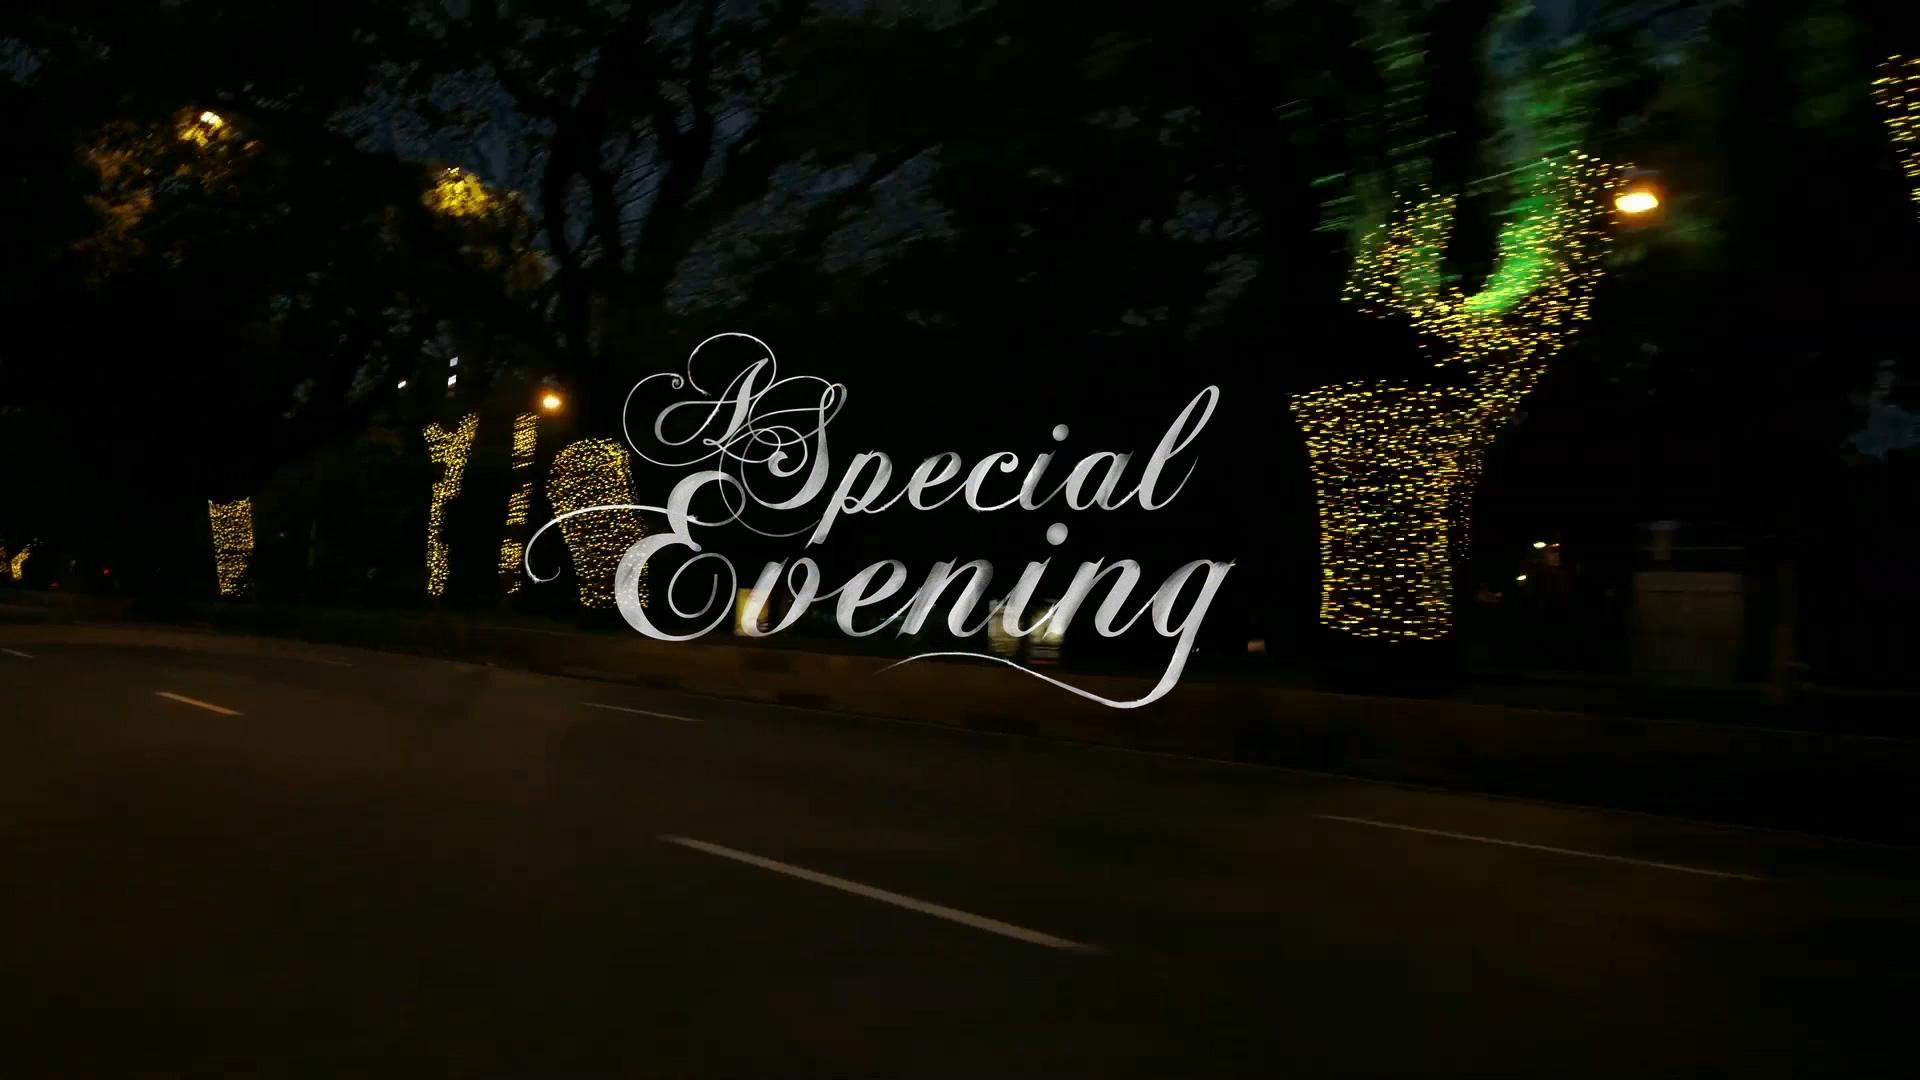 A Special Evening